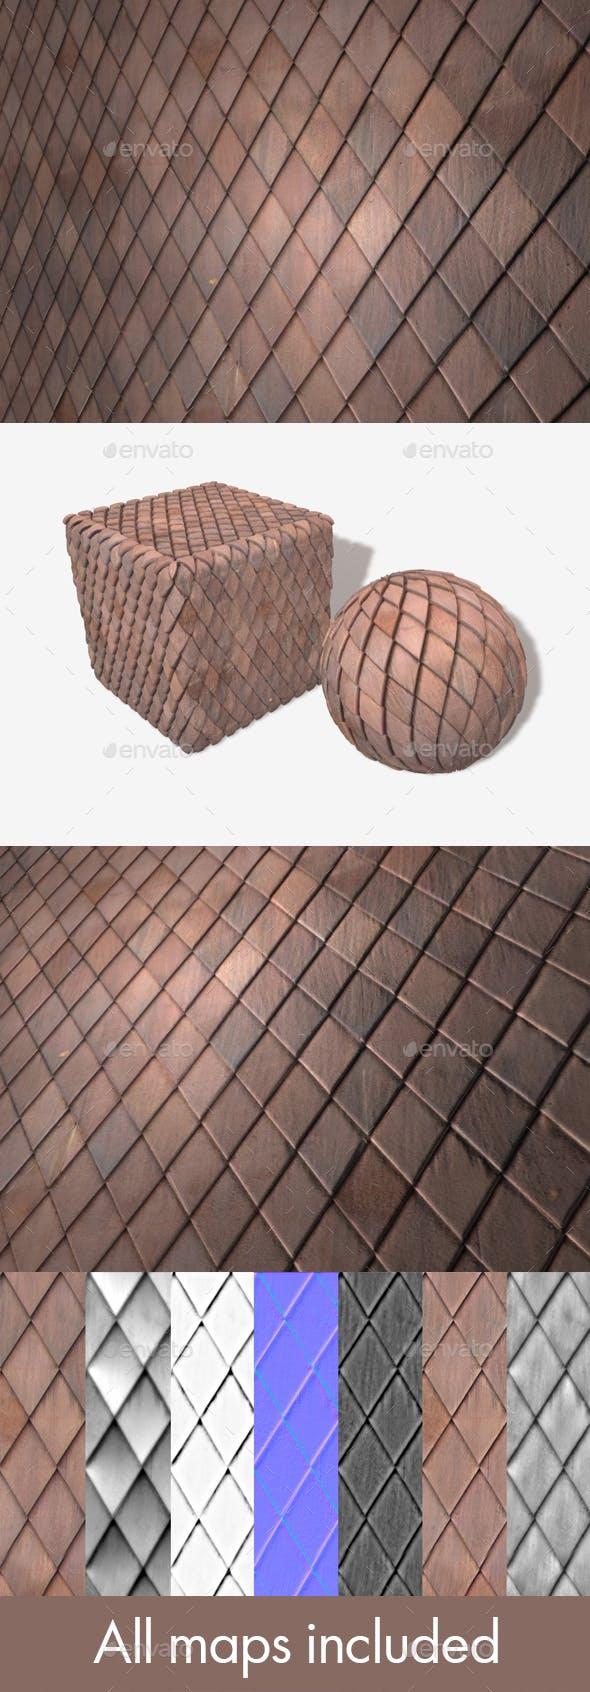 Diamond Wooden Building Tiles Seamless Texture - 3DOcean Item for Sale